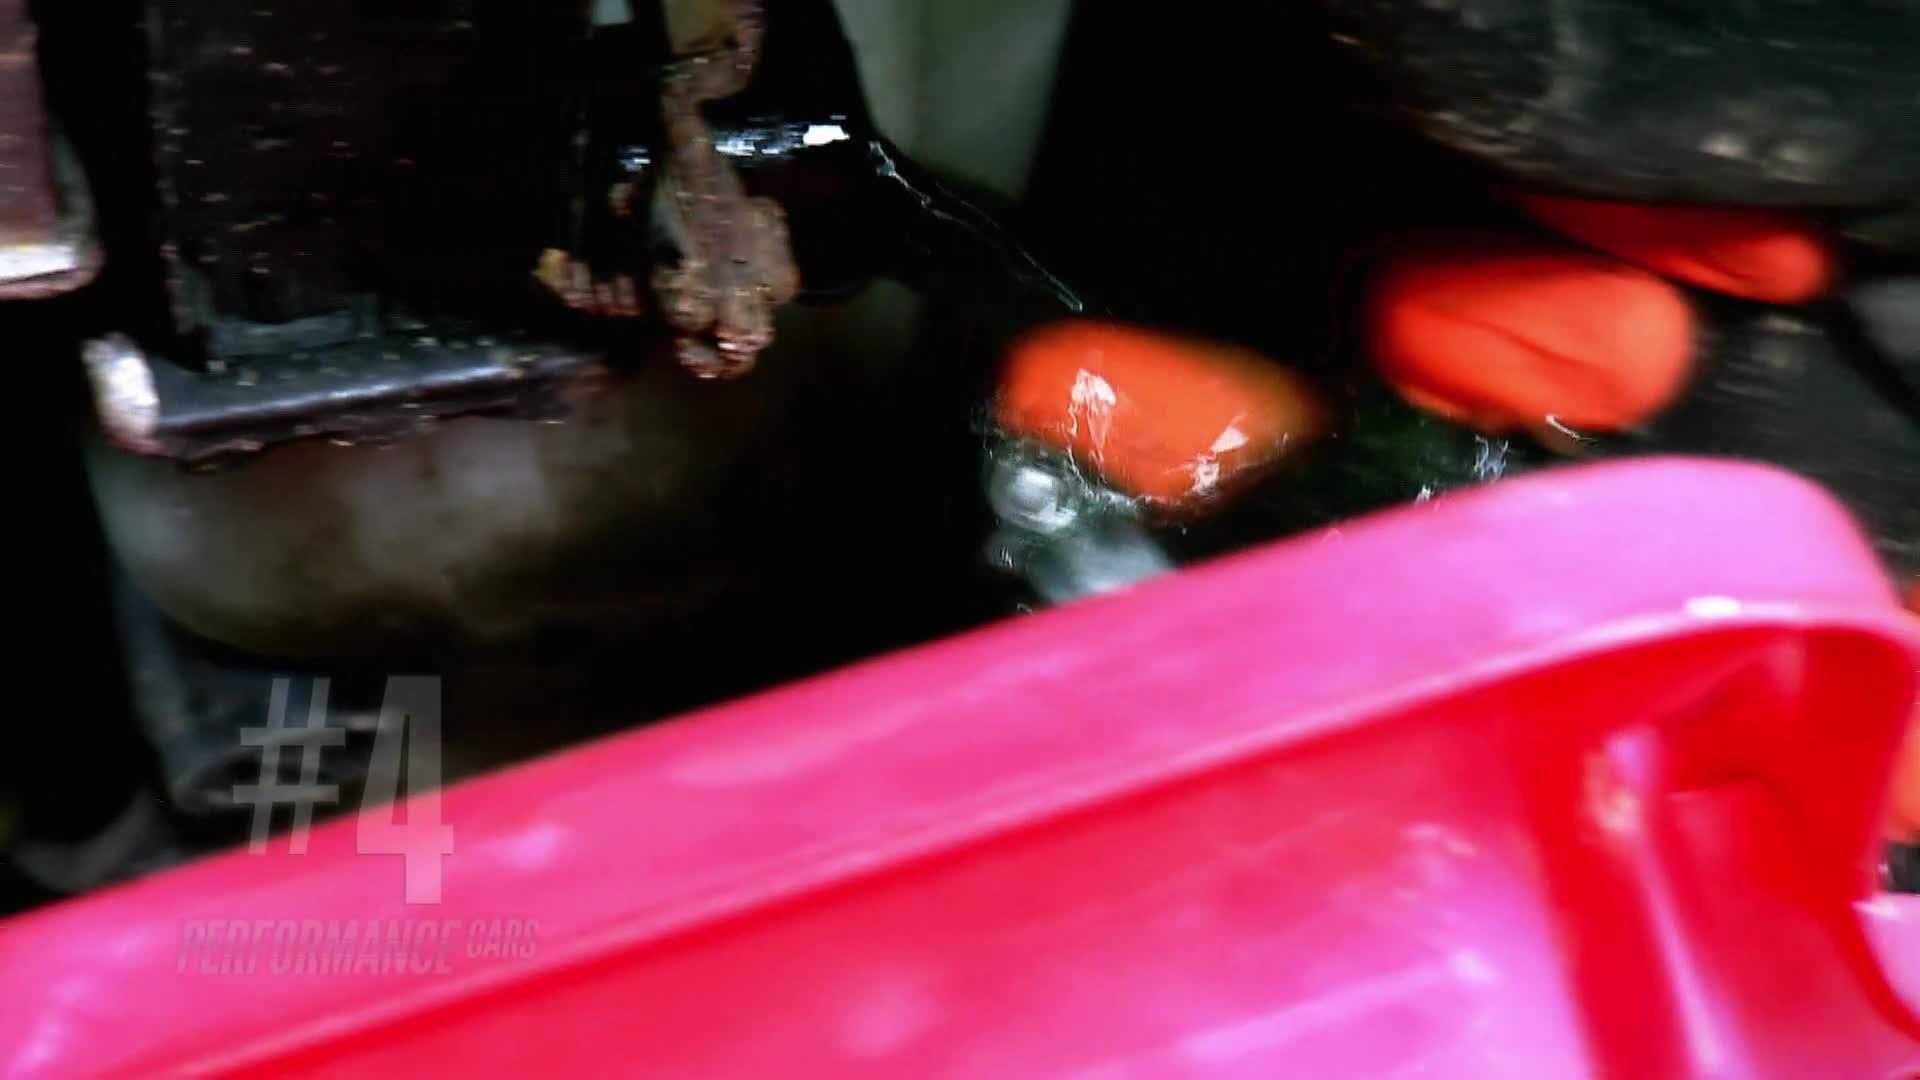 videoasset-15995-1505378591752 Cool Bmw Z1 Joyas sobre Ruedas Cars Trend